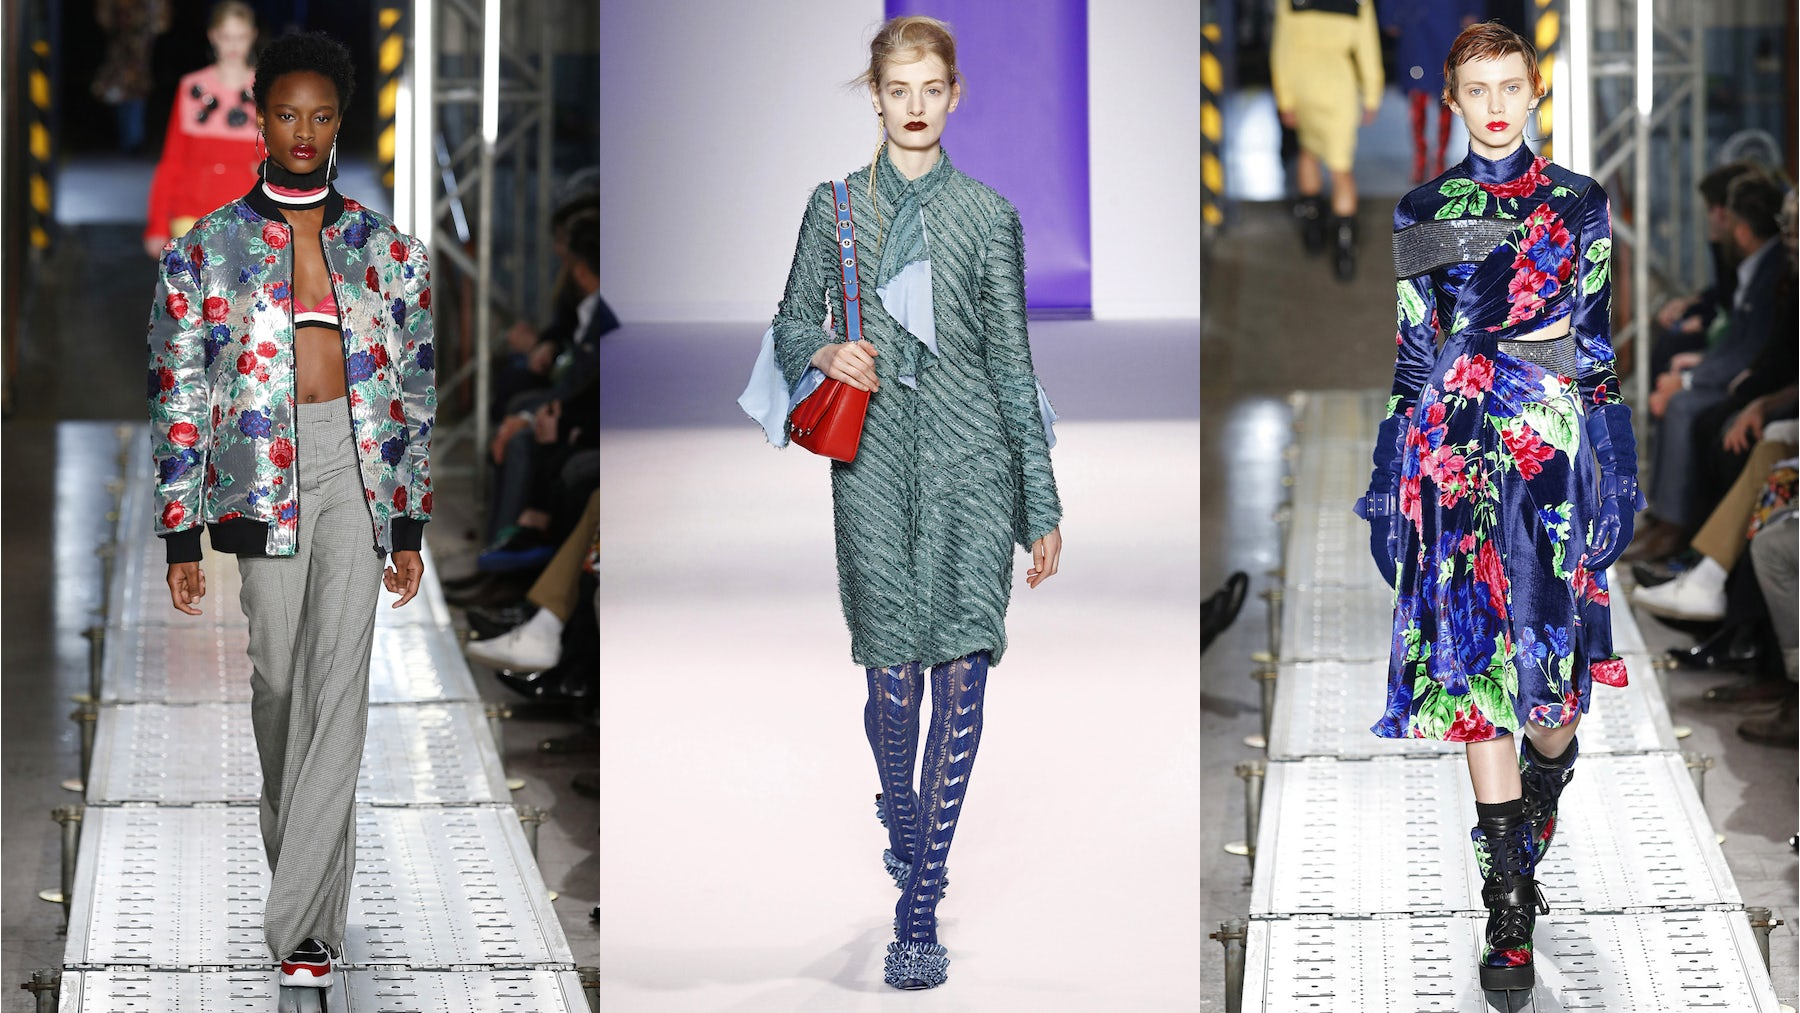 After Long Slumber, Italian Fashion Wakes to 'Beautiful Moment'